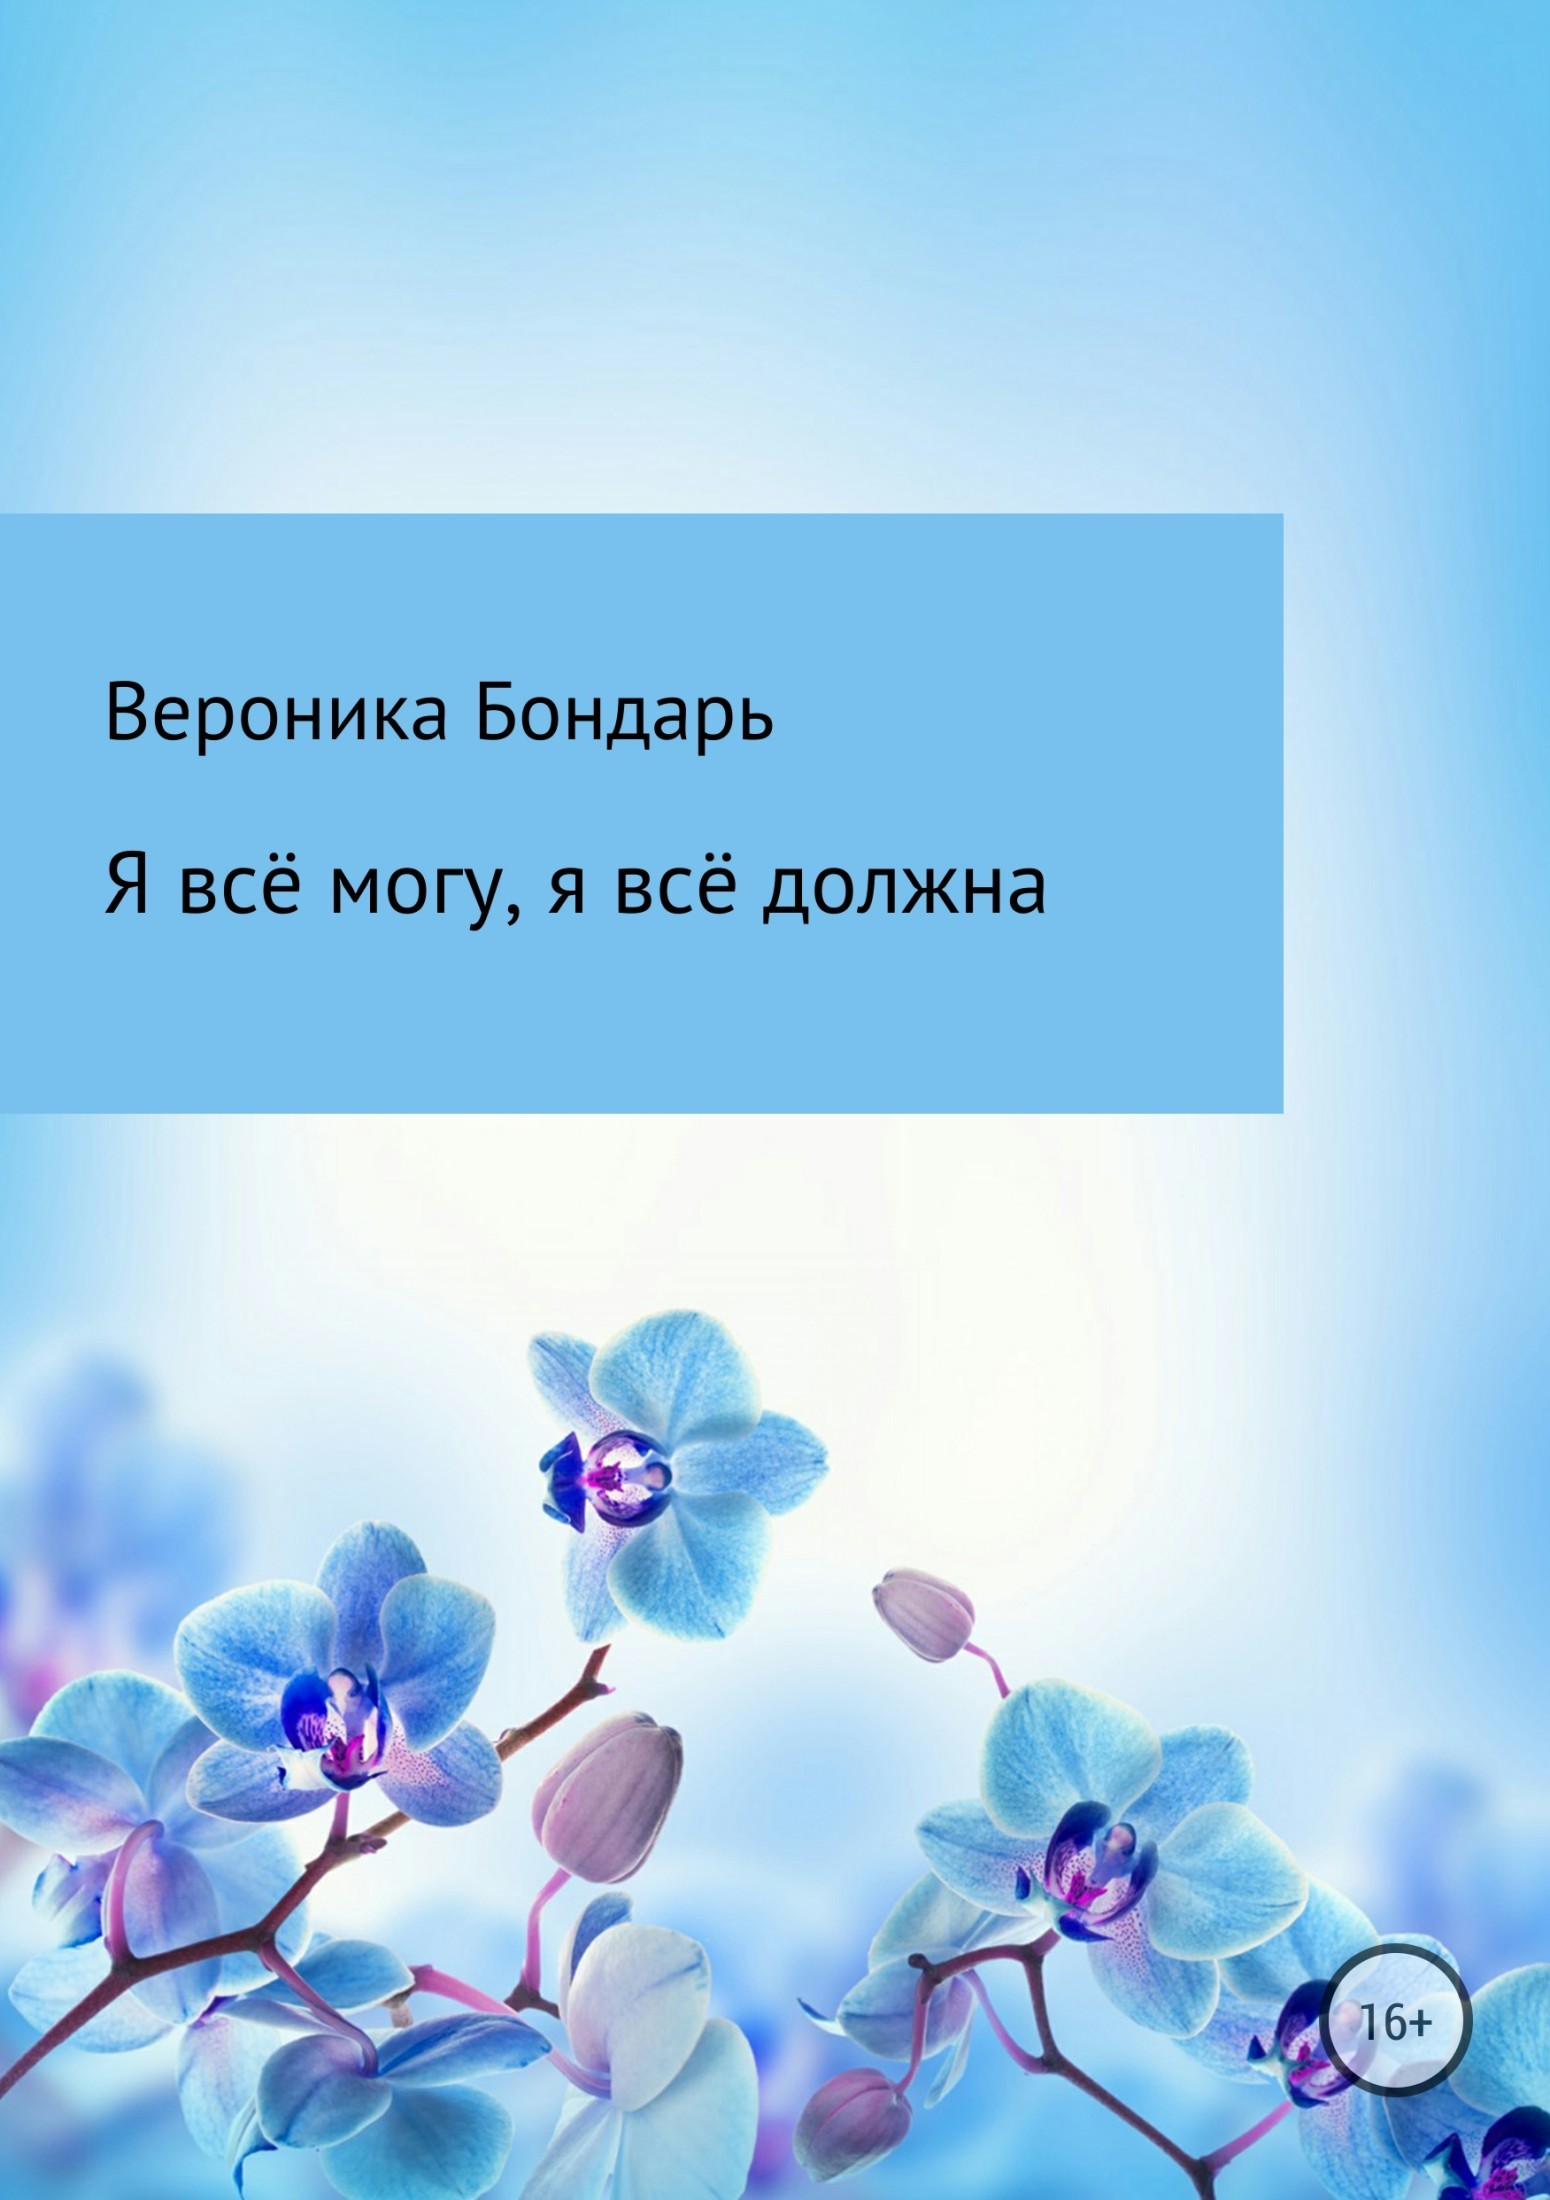 Вероника Павловна Бондарь бесплатно